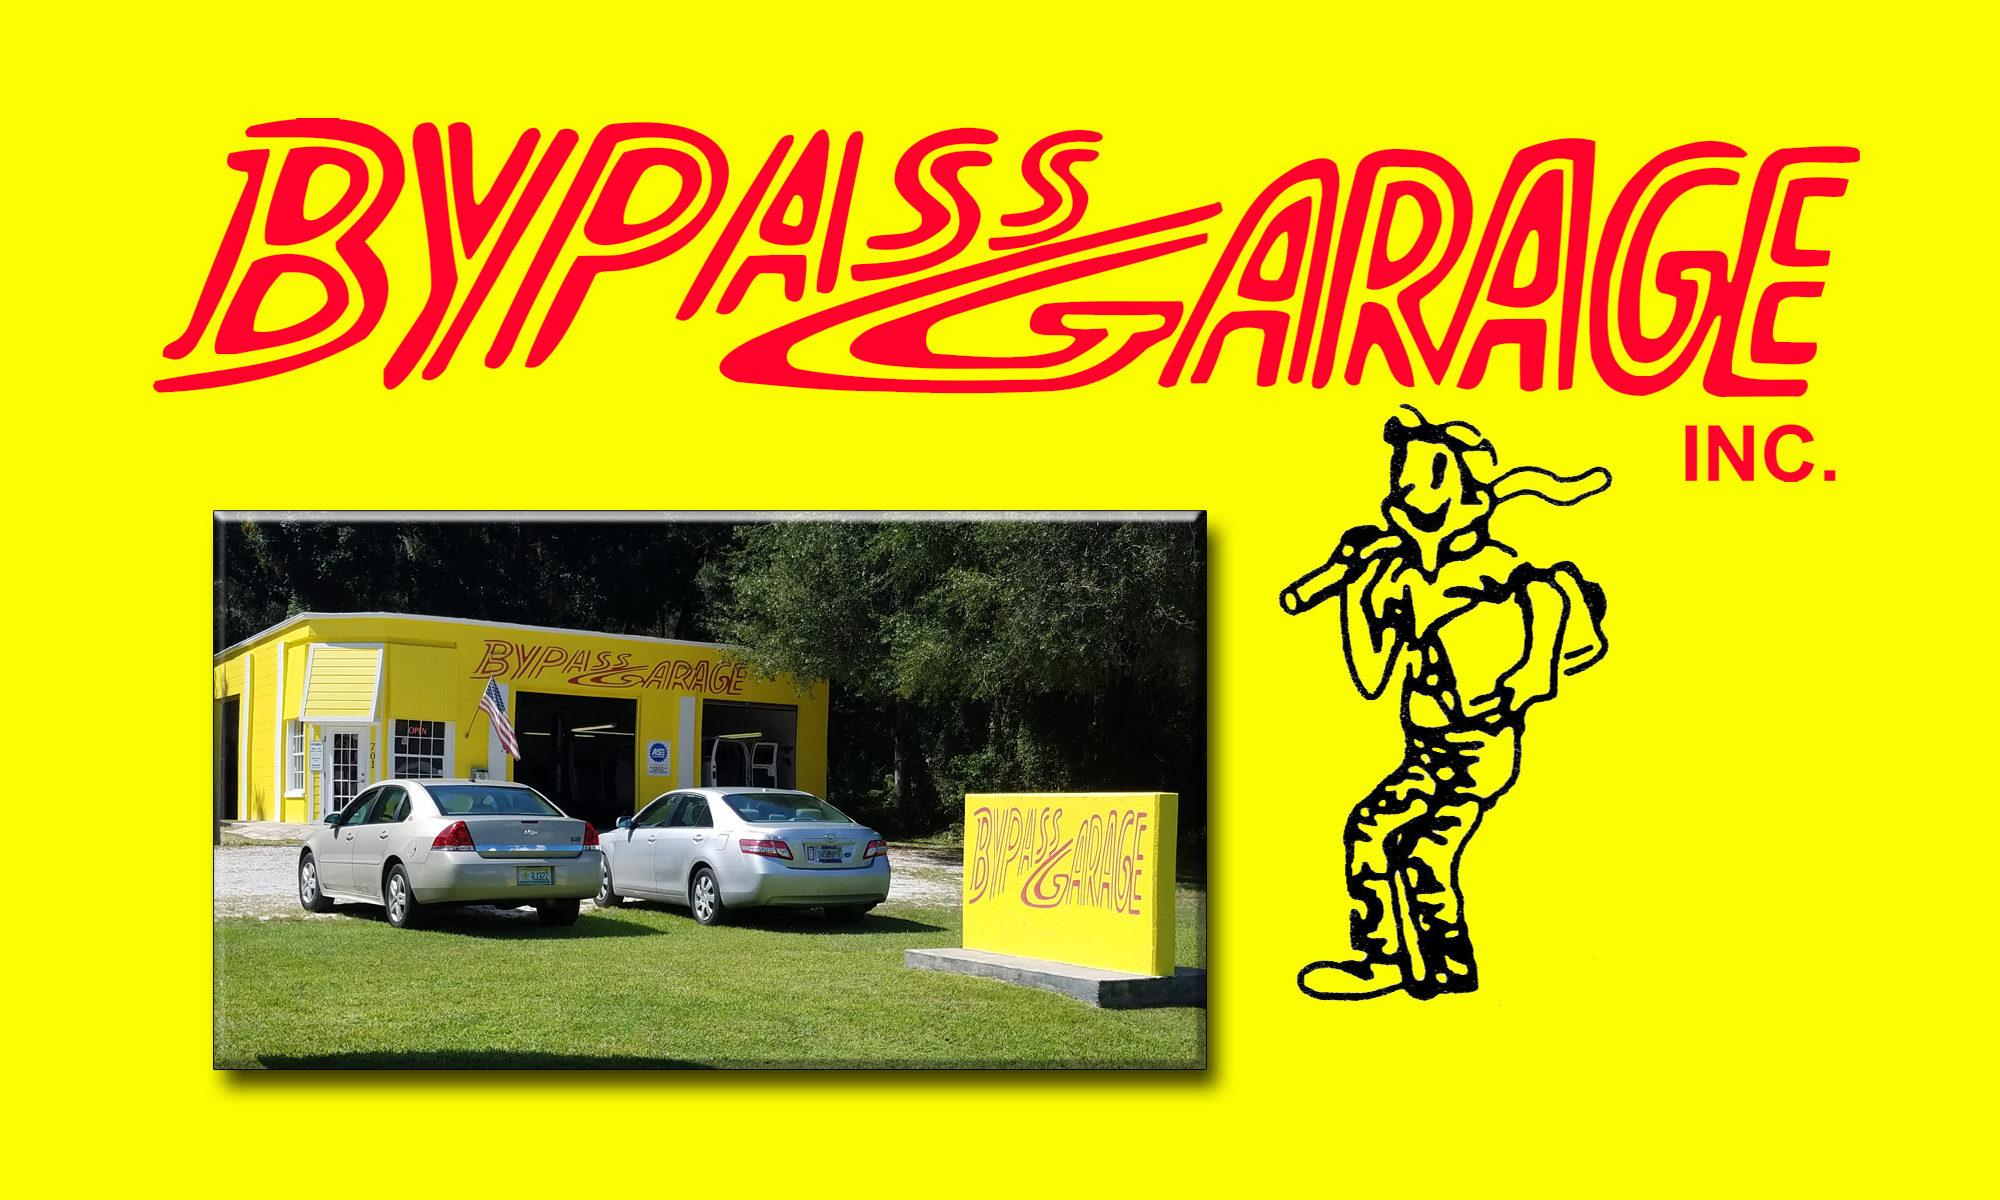 bypassgarage.com